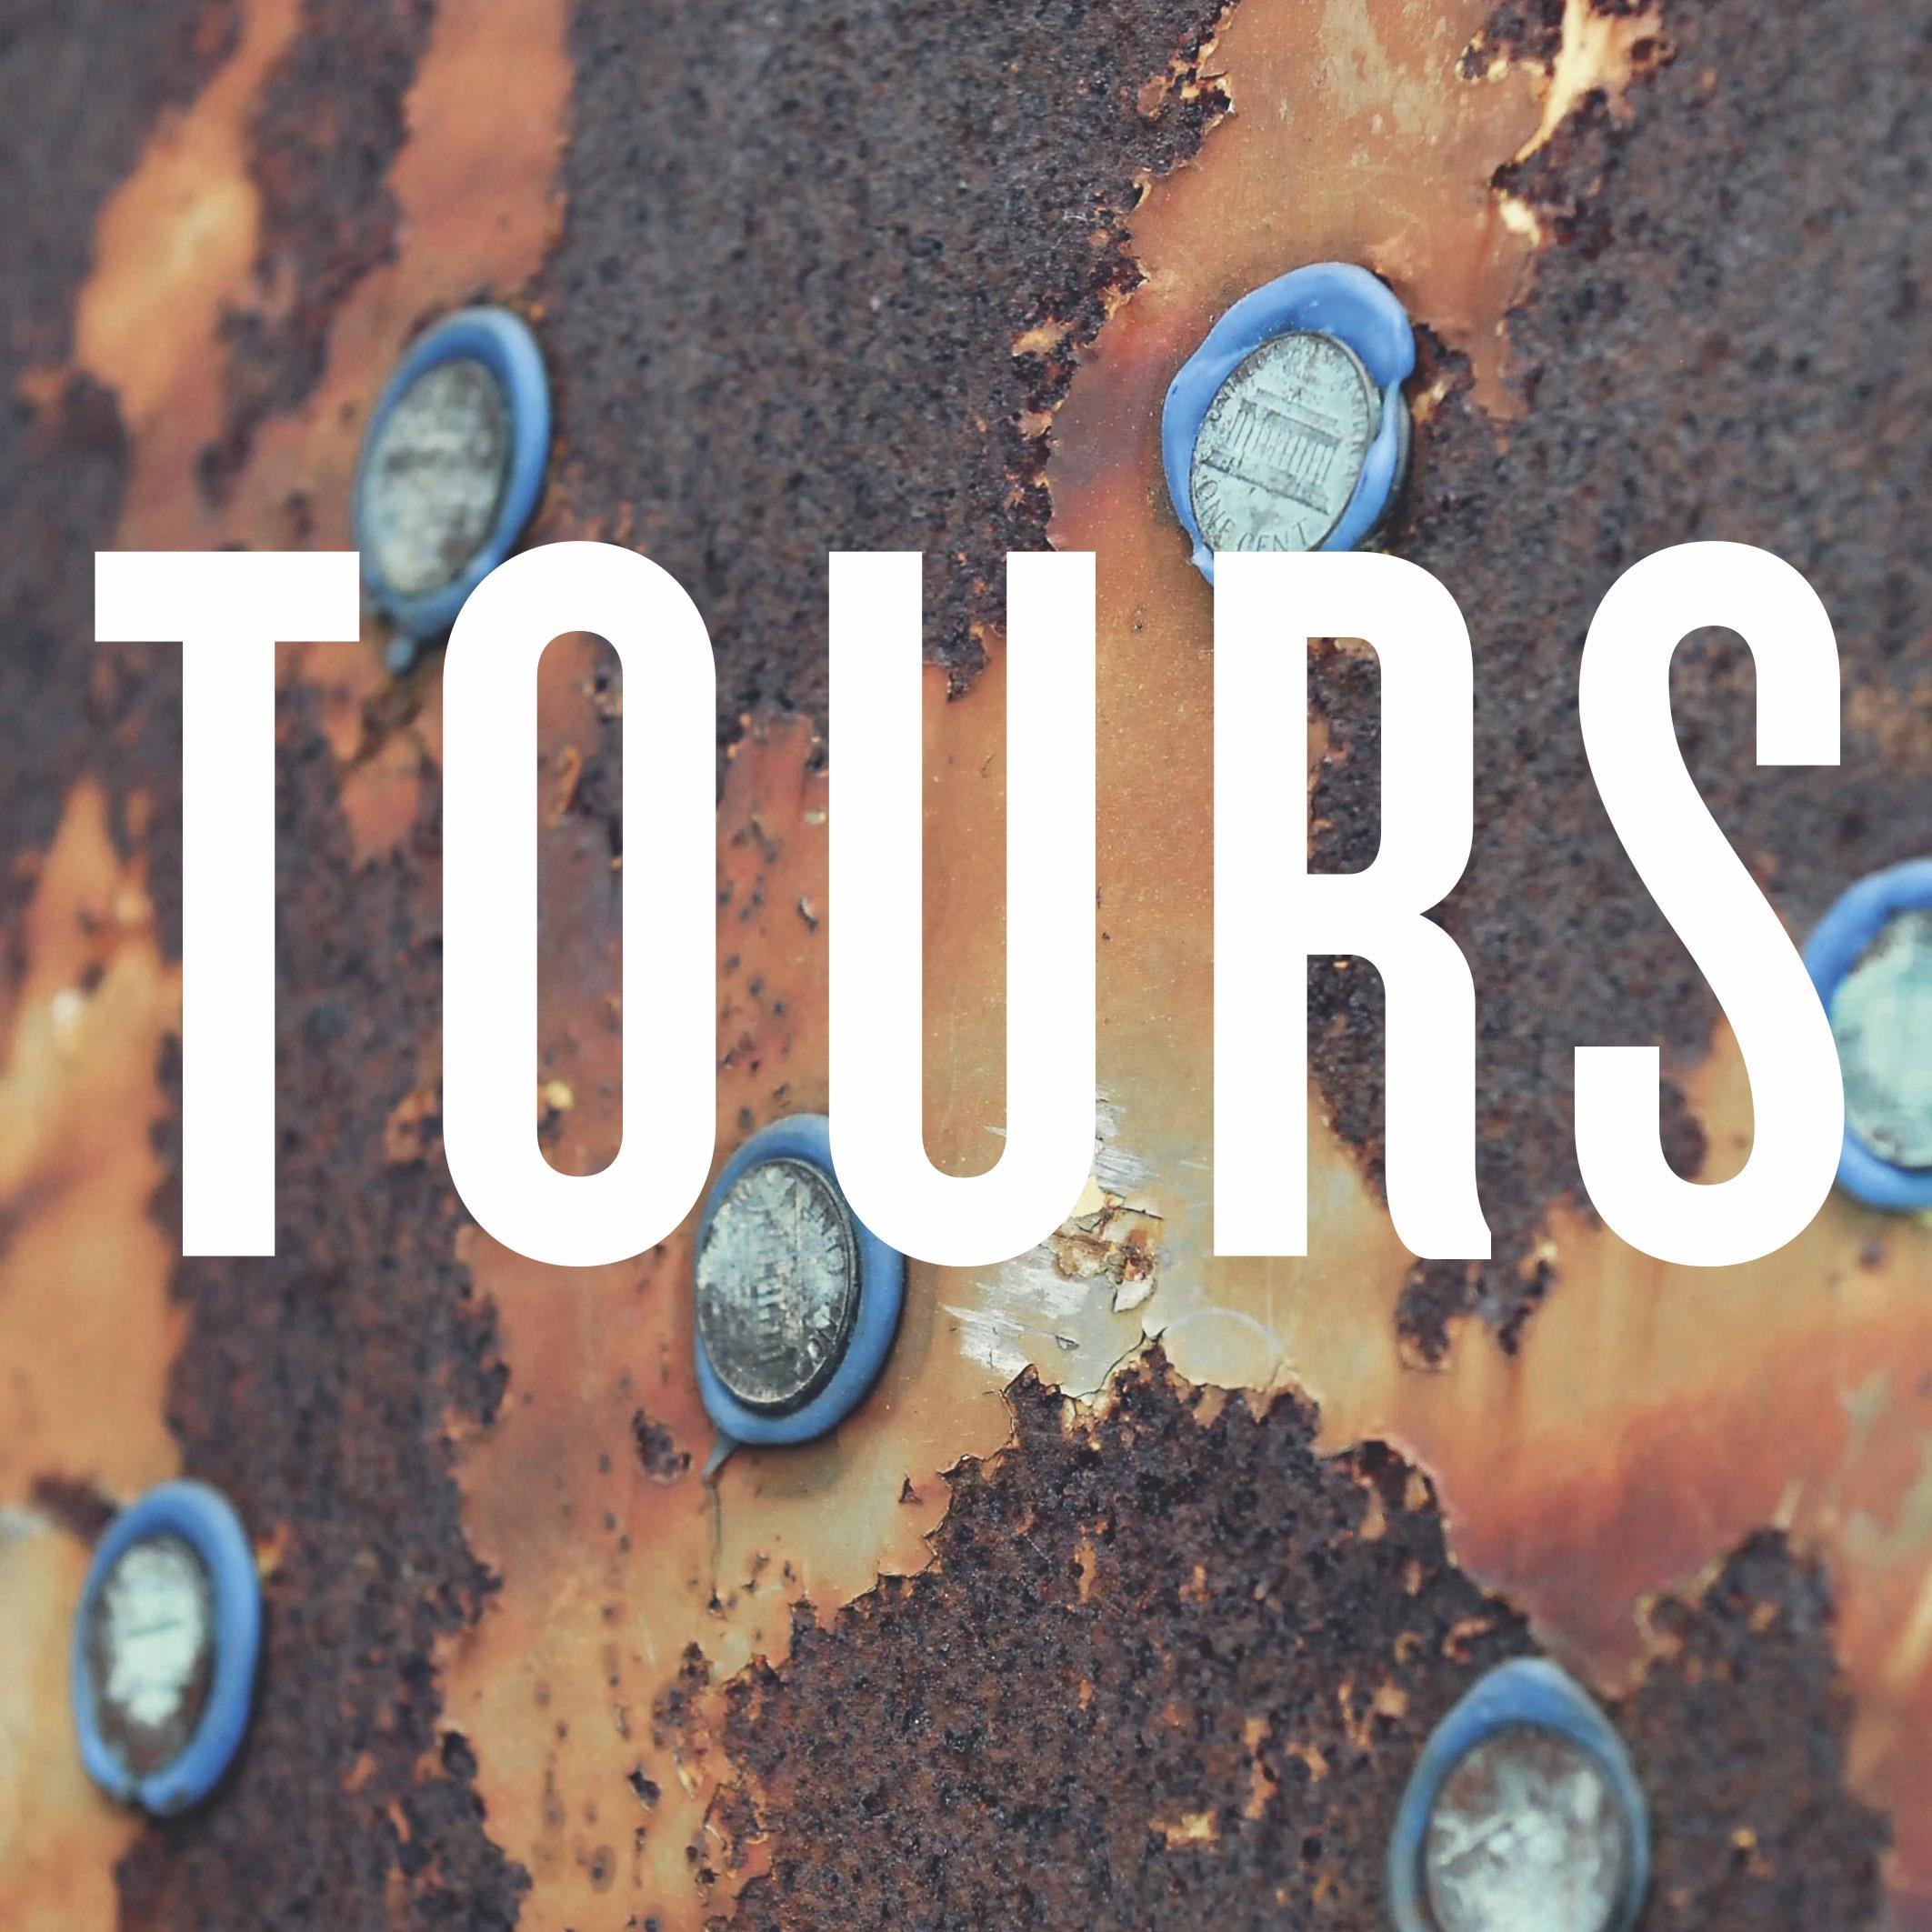 University of Texas Landmarks - Represents tout lipski square